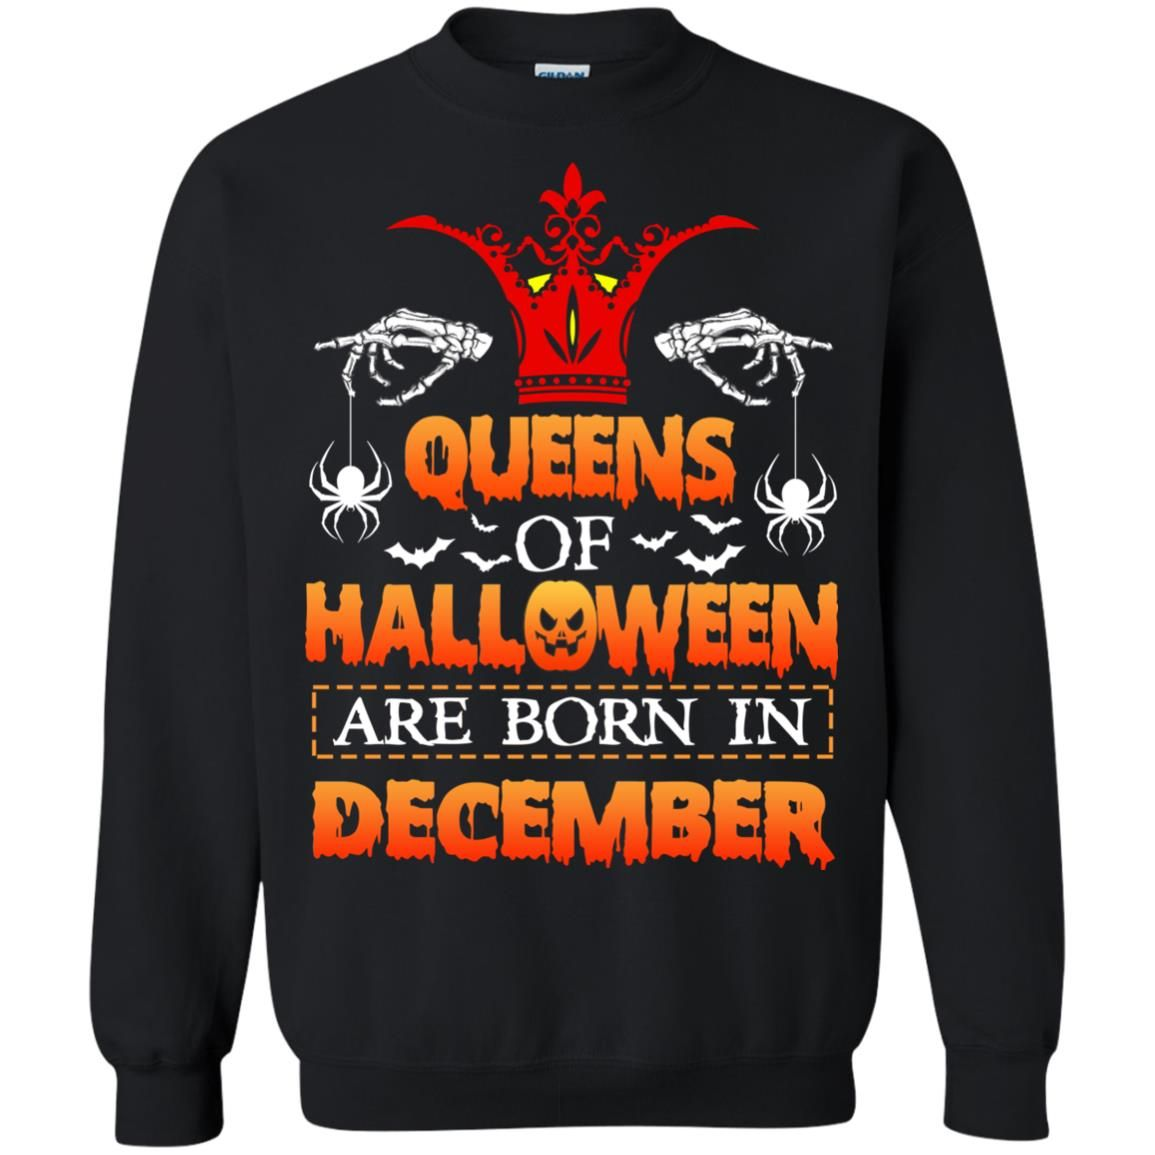 image 966 - Queens of Halloween are born in December shirt, tank top, hoodie